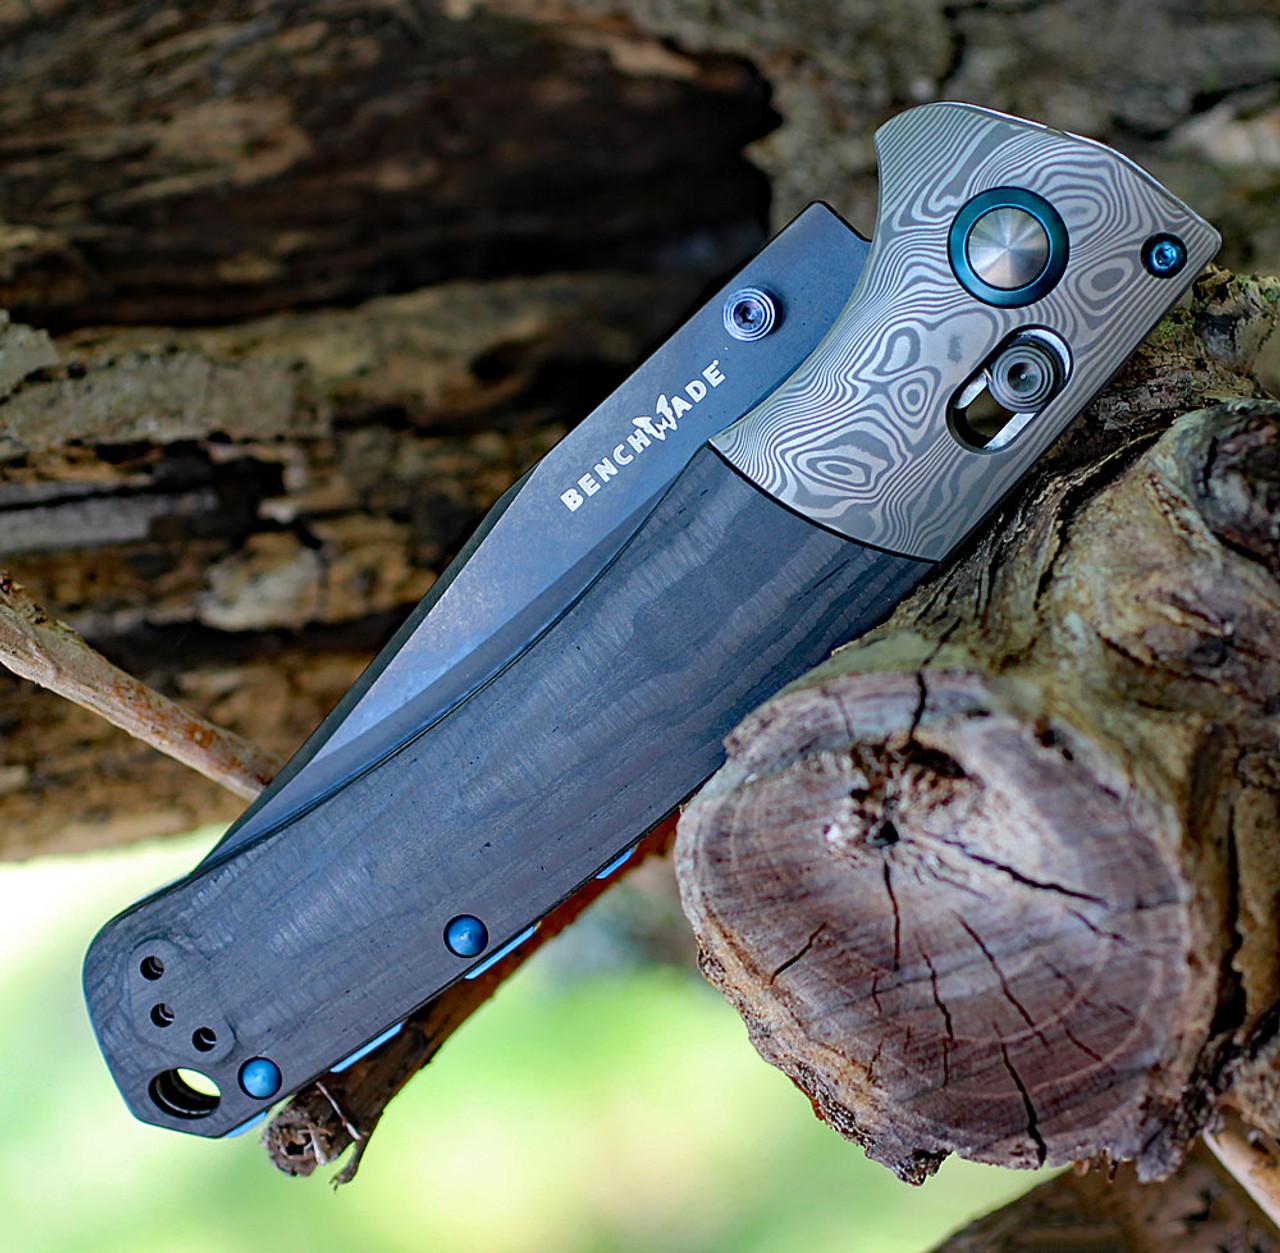 "Benchmade 15080BK-191 Crooked River Gold lass, 4"" CPM-20CV Black Plain Blade, Unidirectional Carbon Fiber Handle"